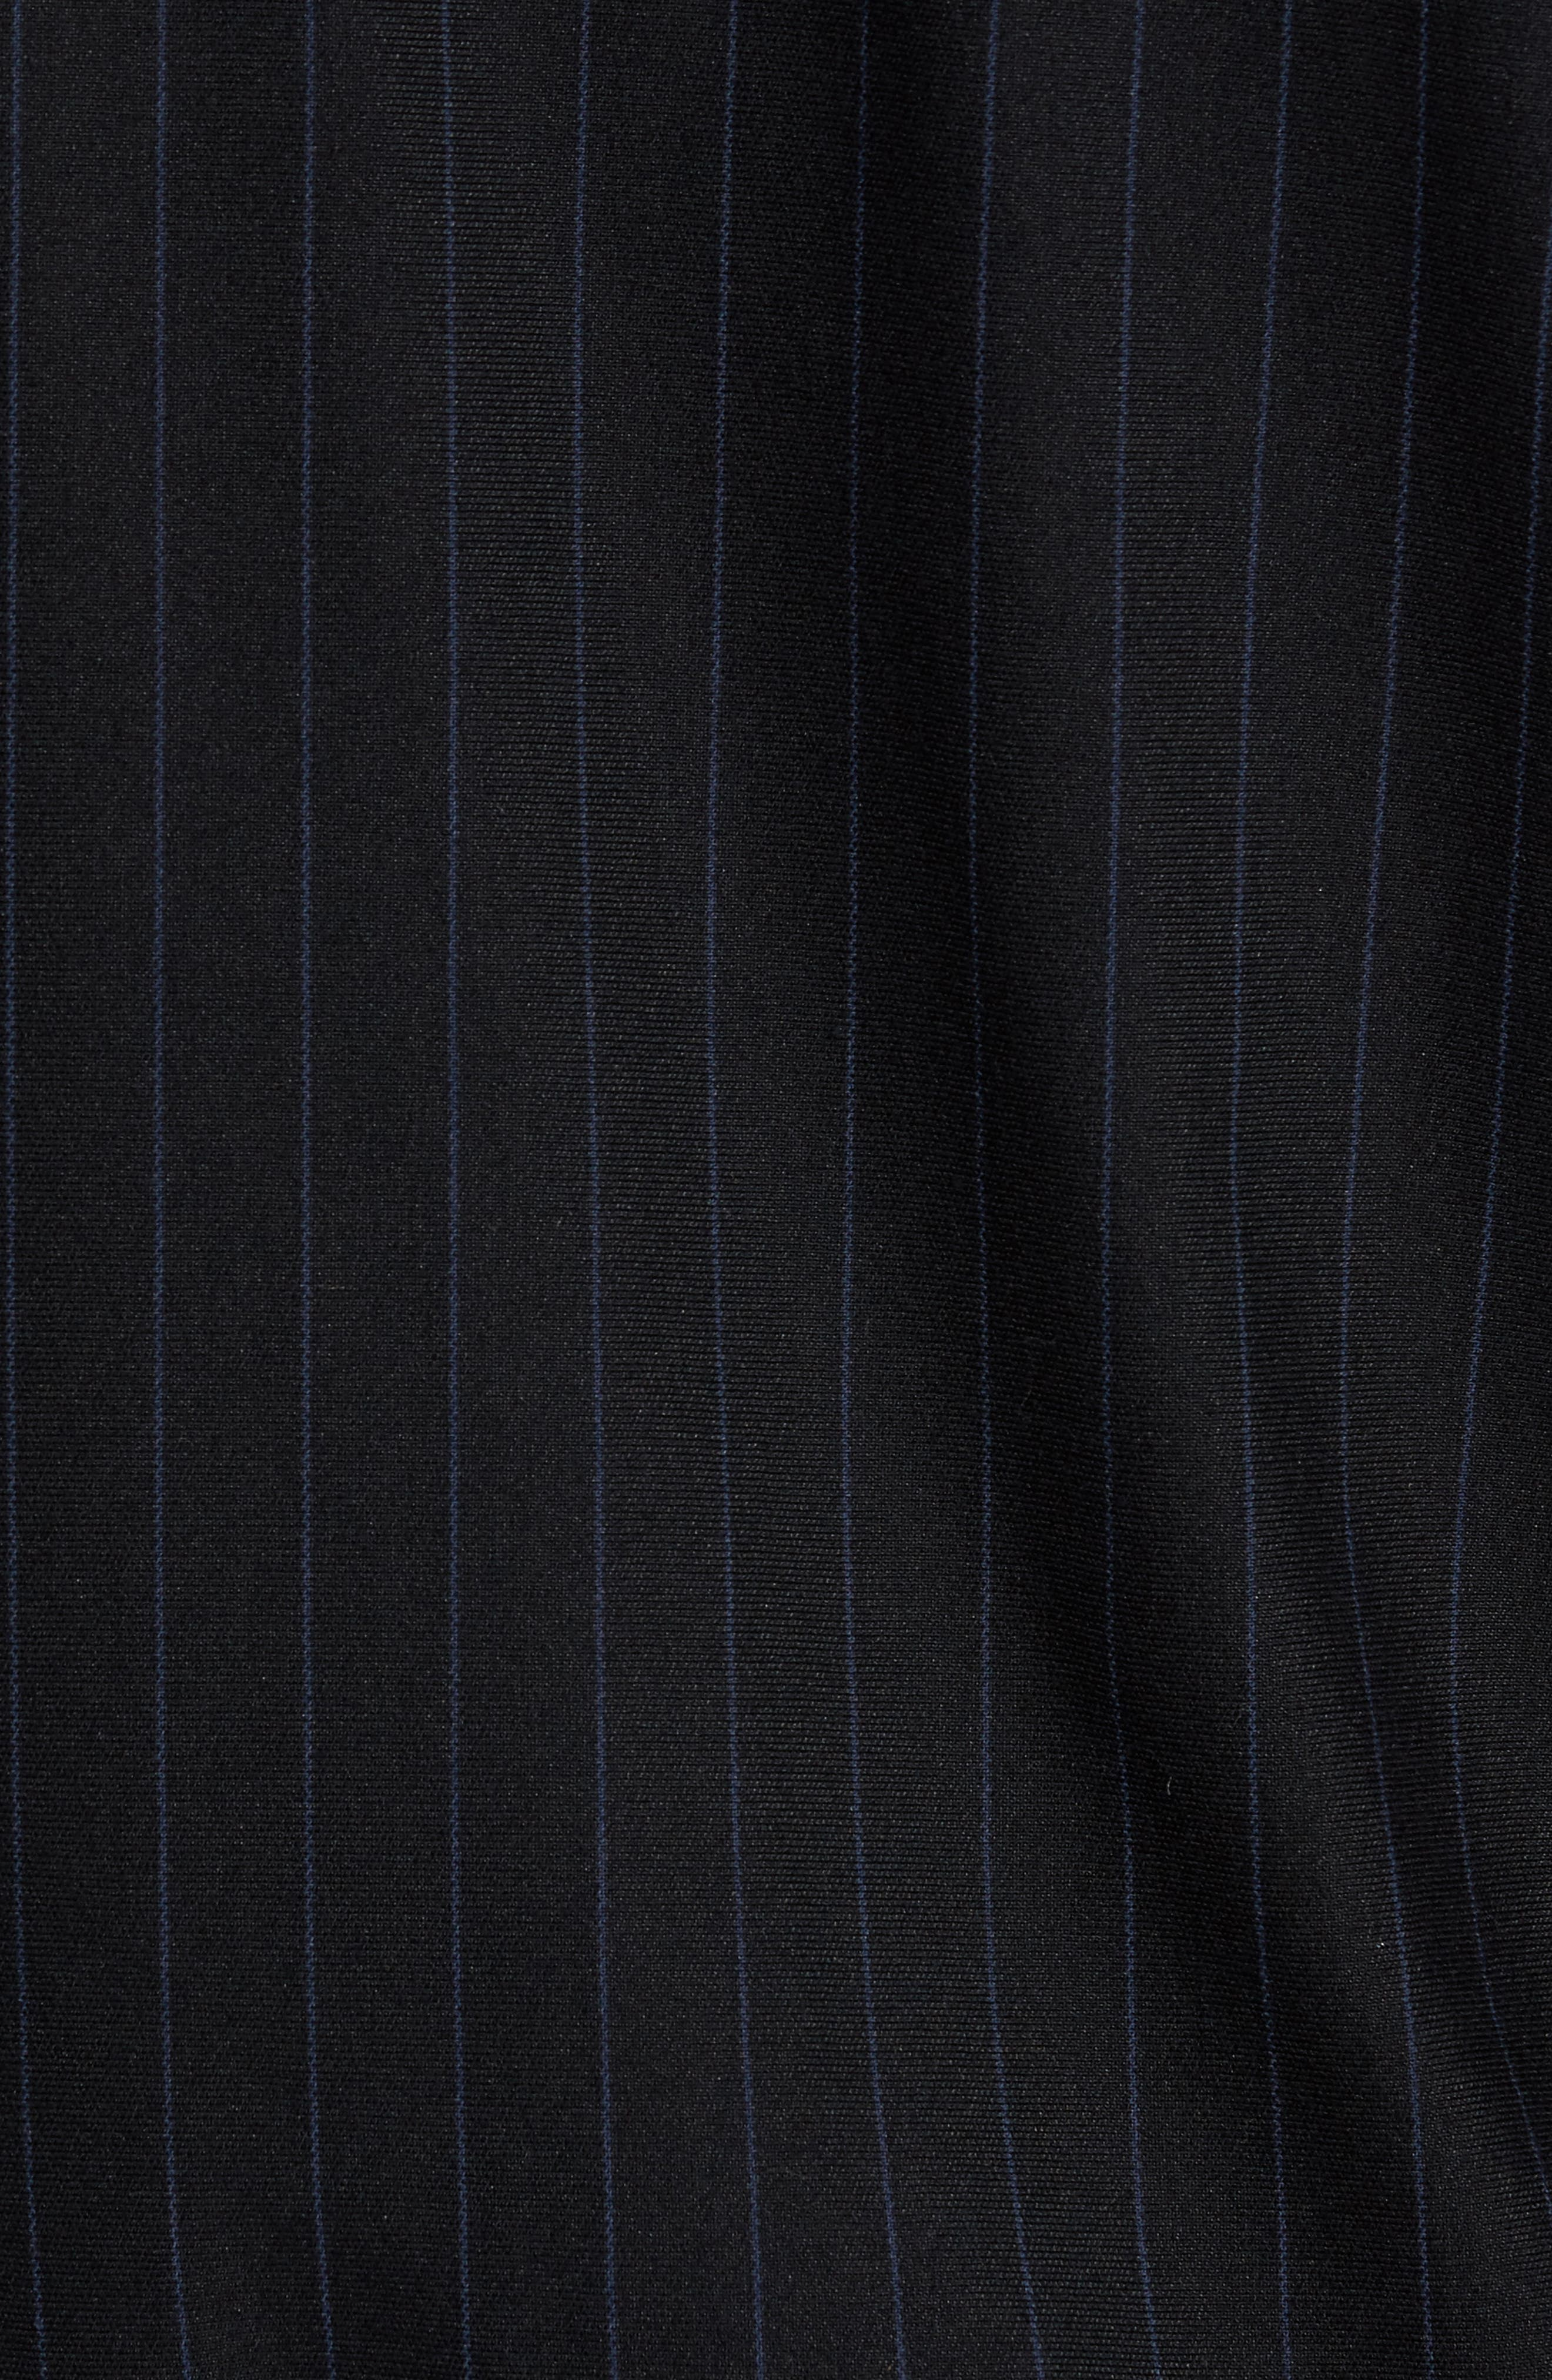 Pinstripe Track Jacket,                             Alternate thumbnail 4, color,                             Black